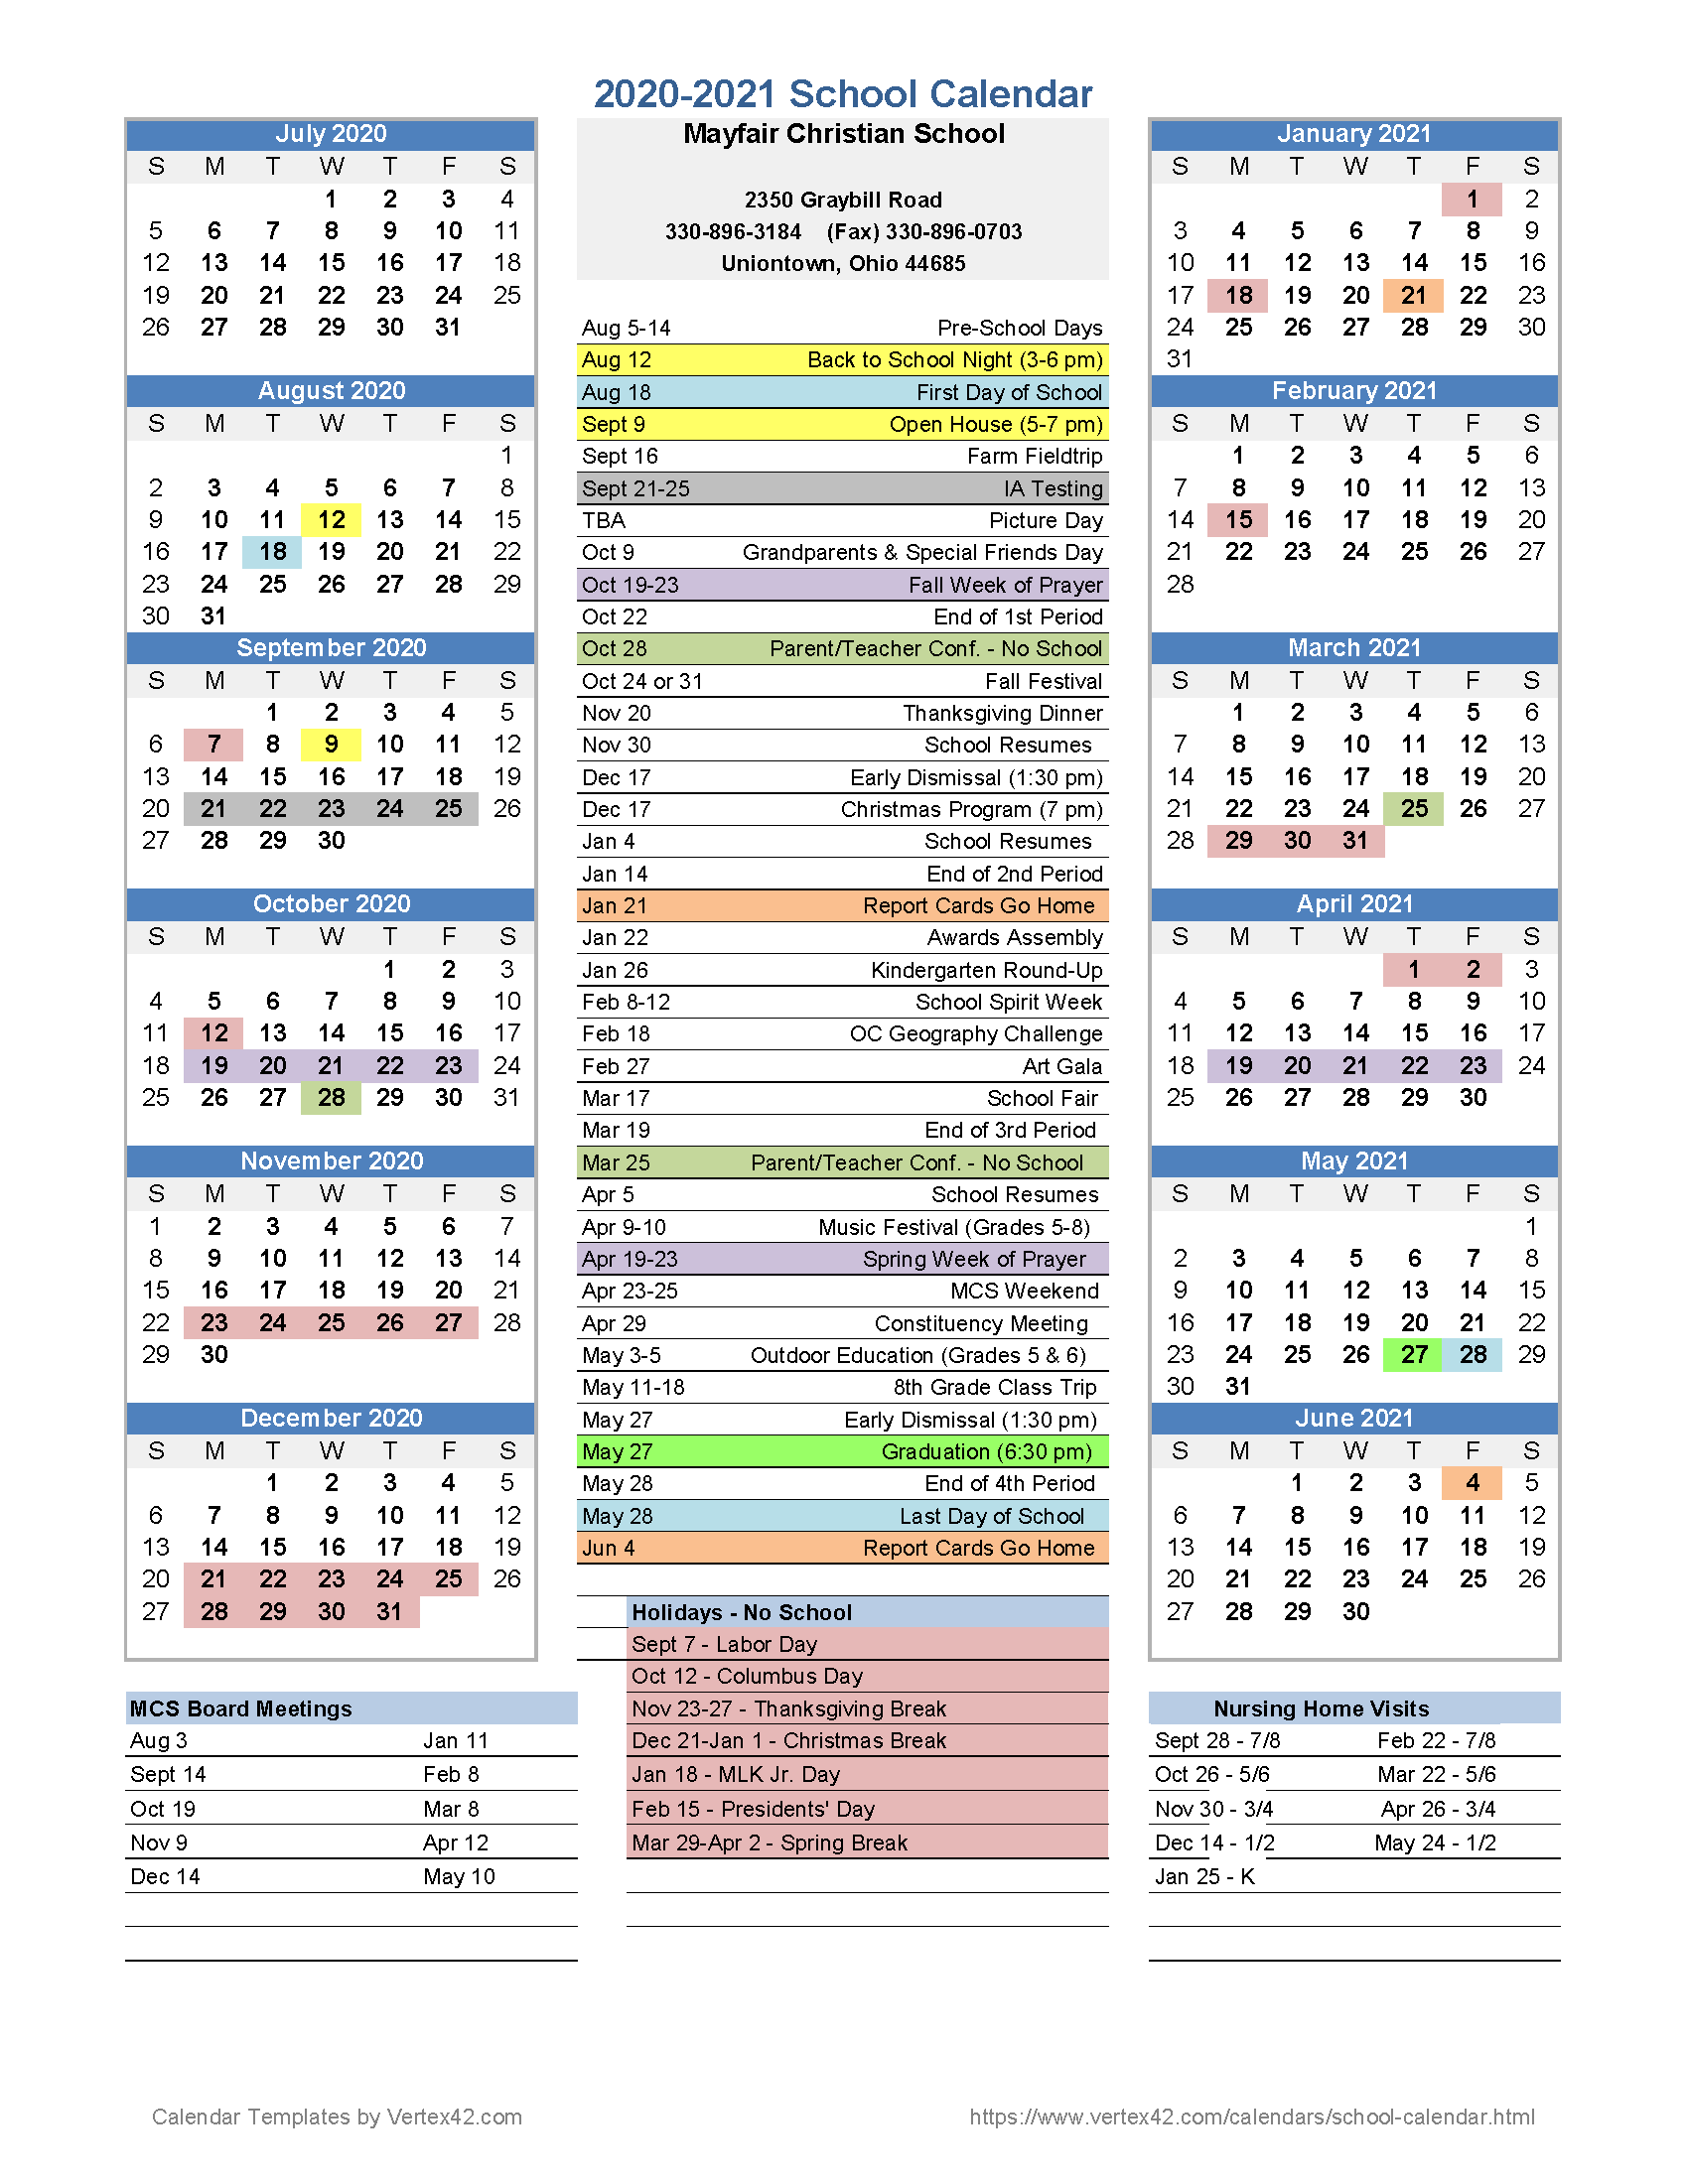 Calendar | Mayfair Christian School For University Of Akron 2020 Calendar